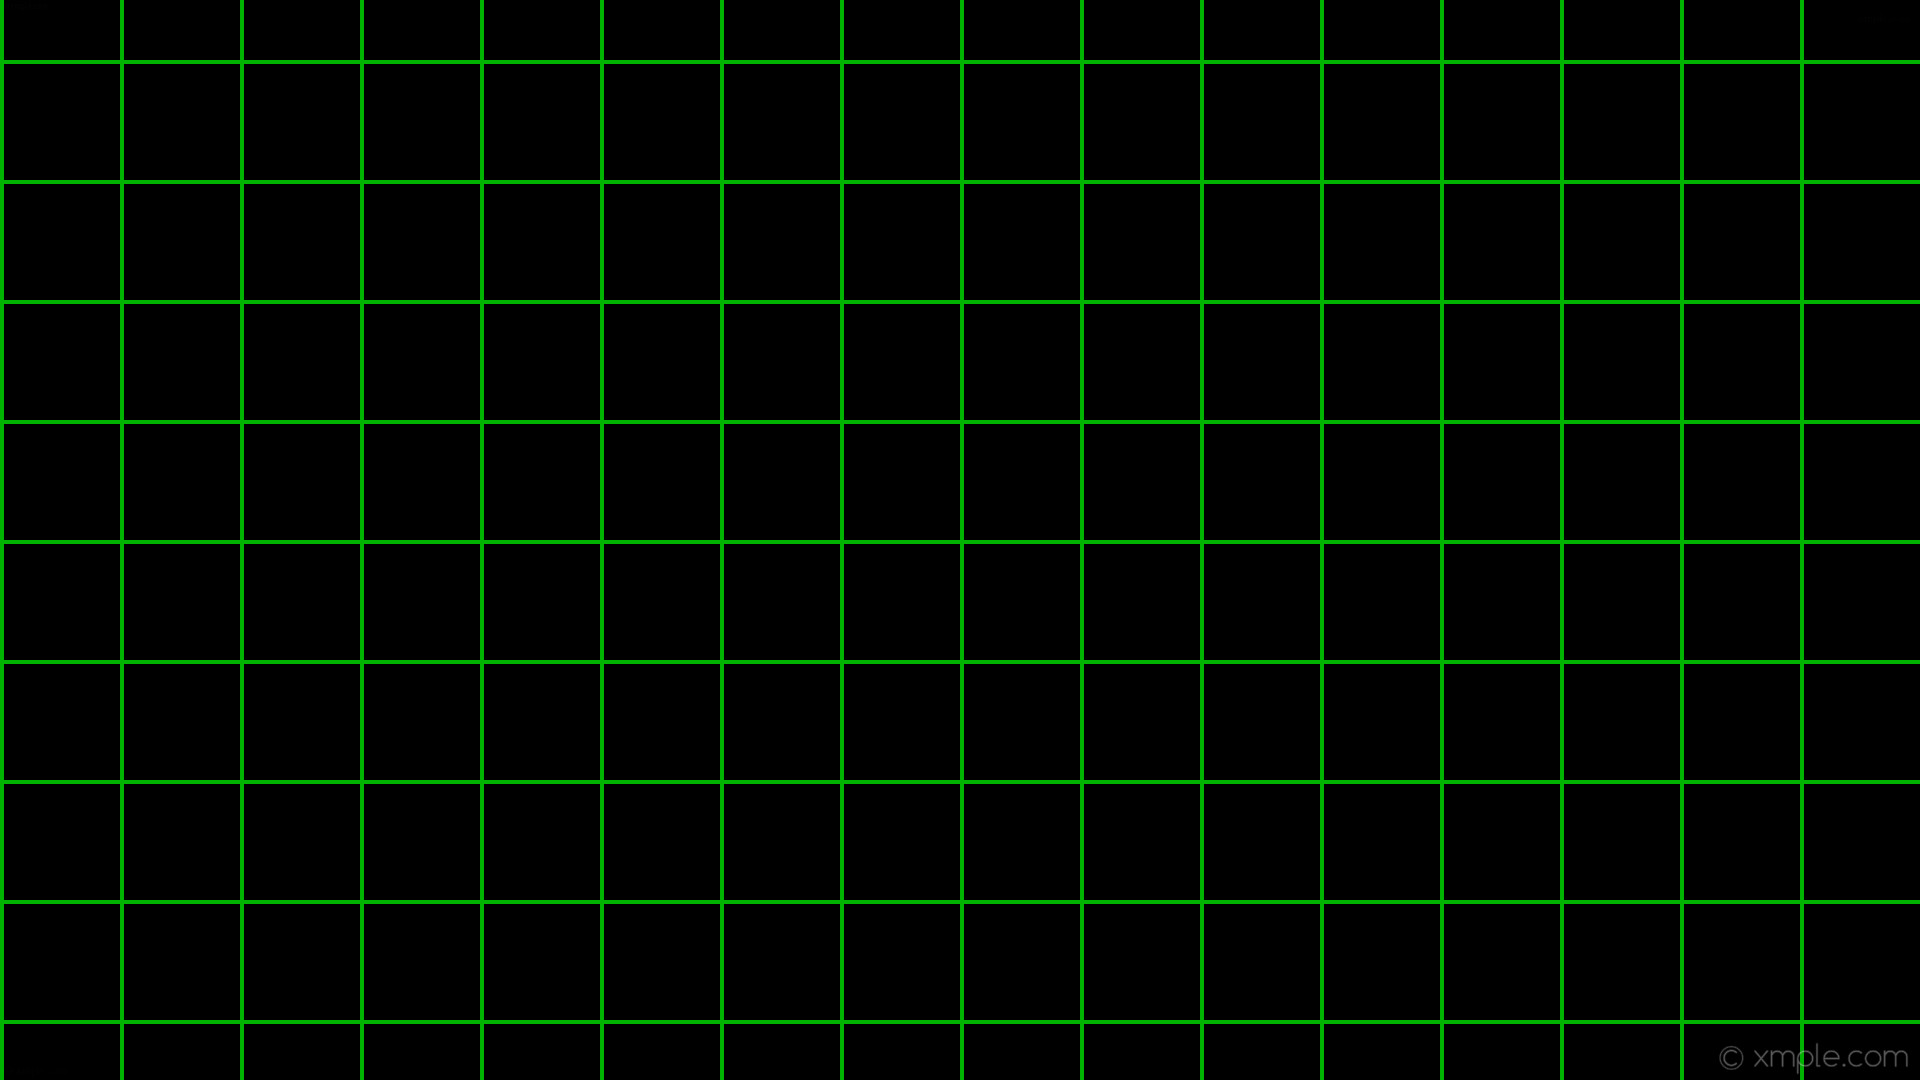 green neon green aesthetic background